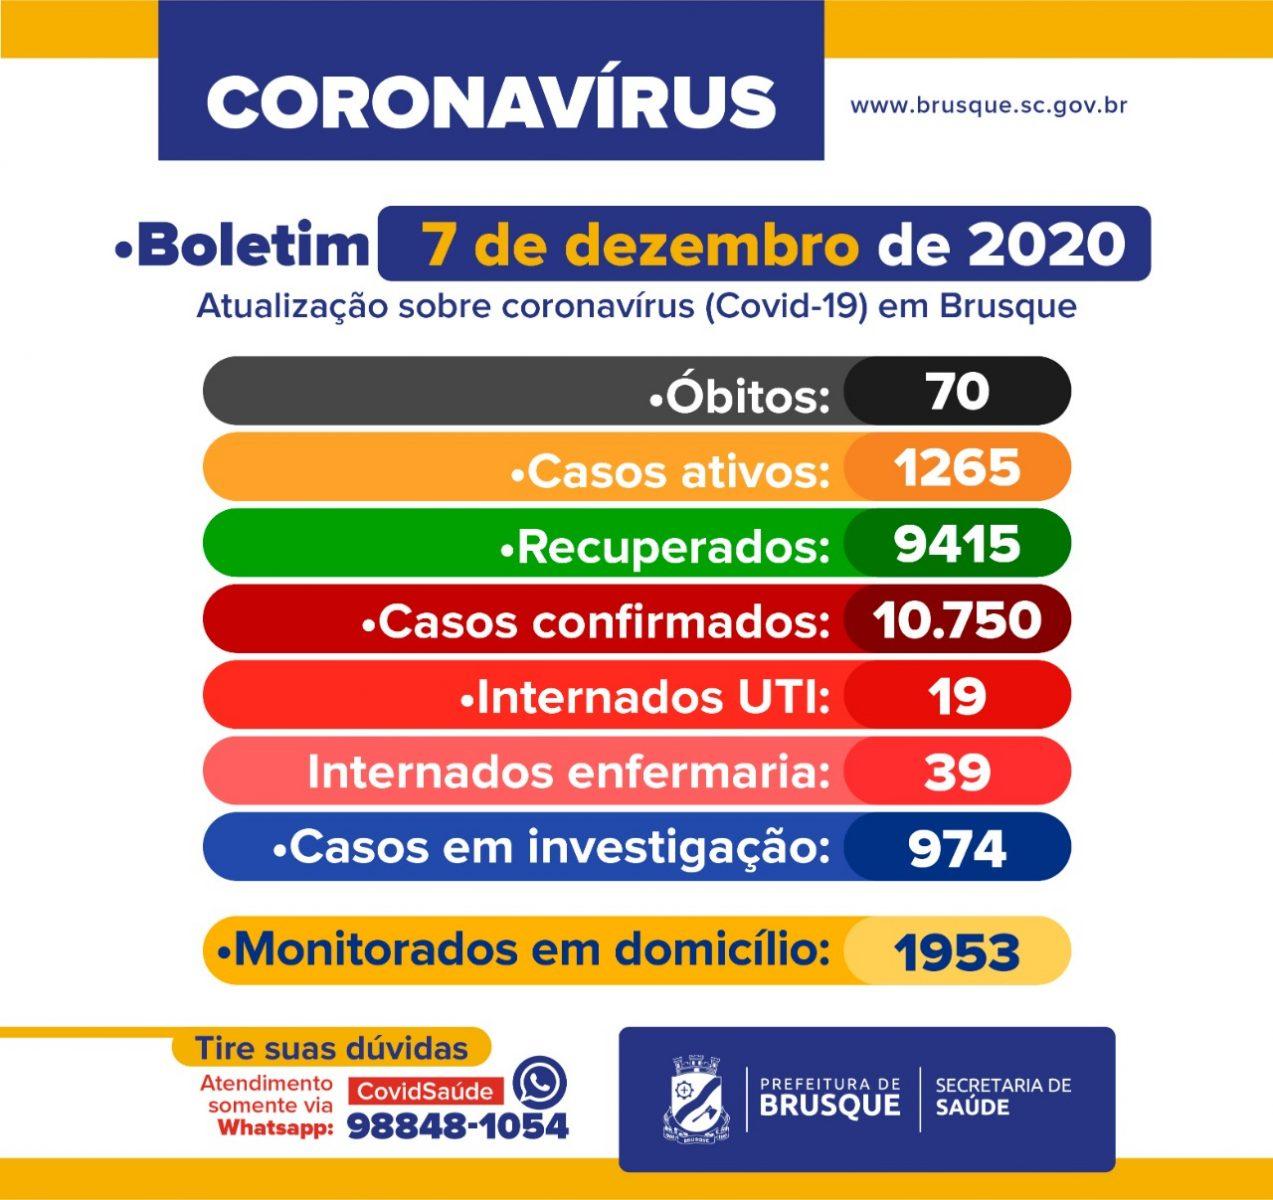 Covid-19: Boletim epidemiológico de 7 de dezembro